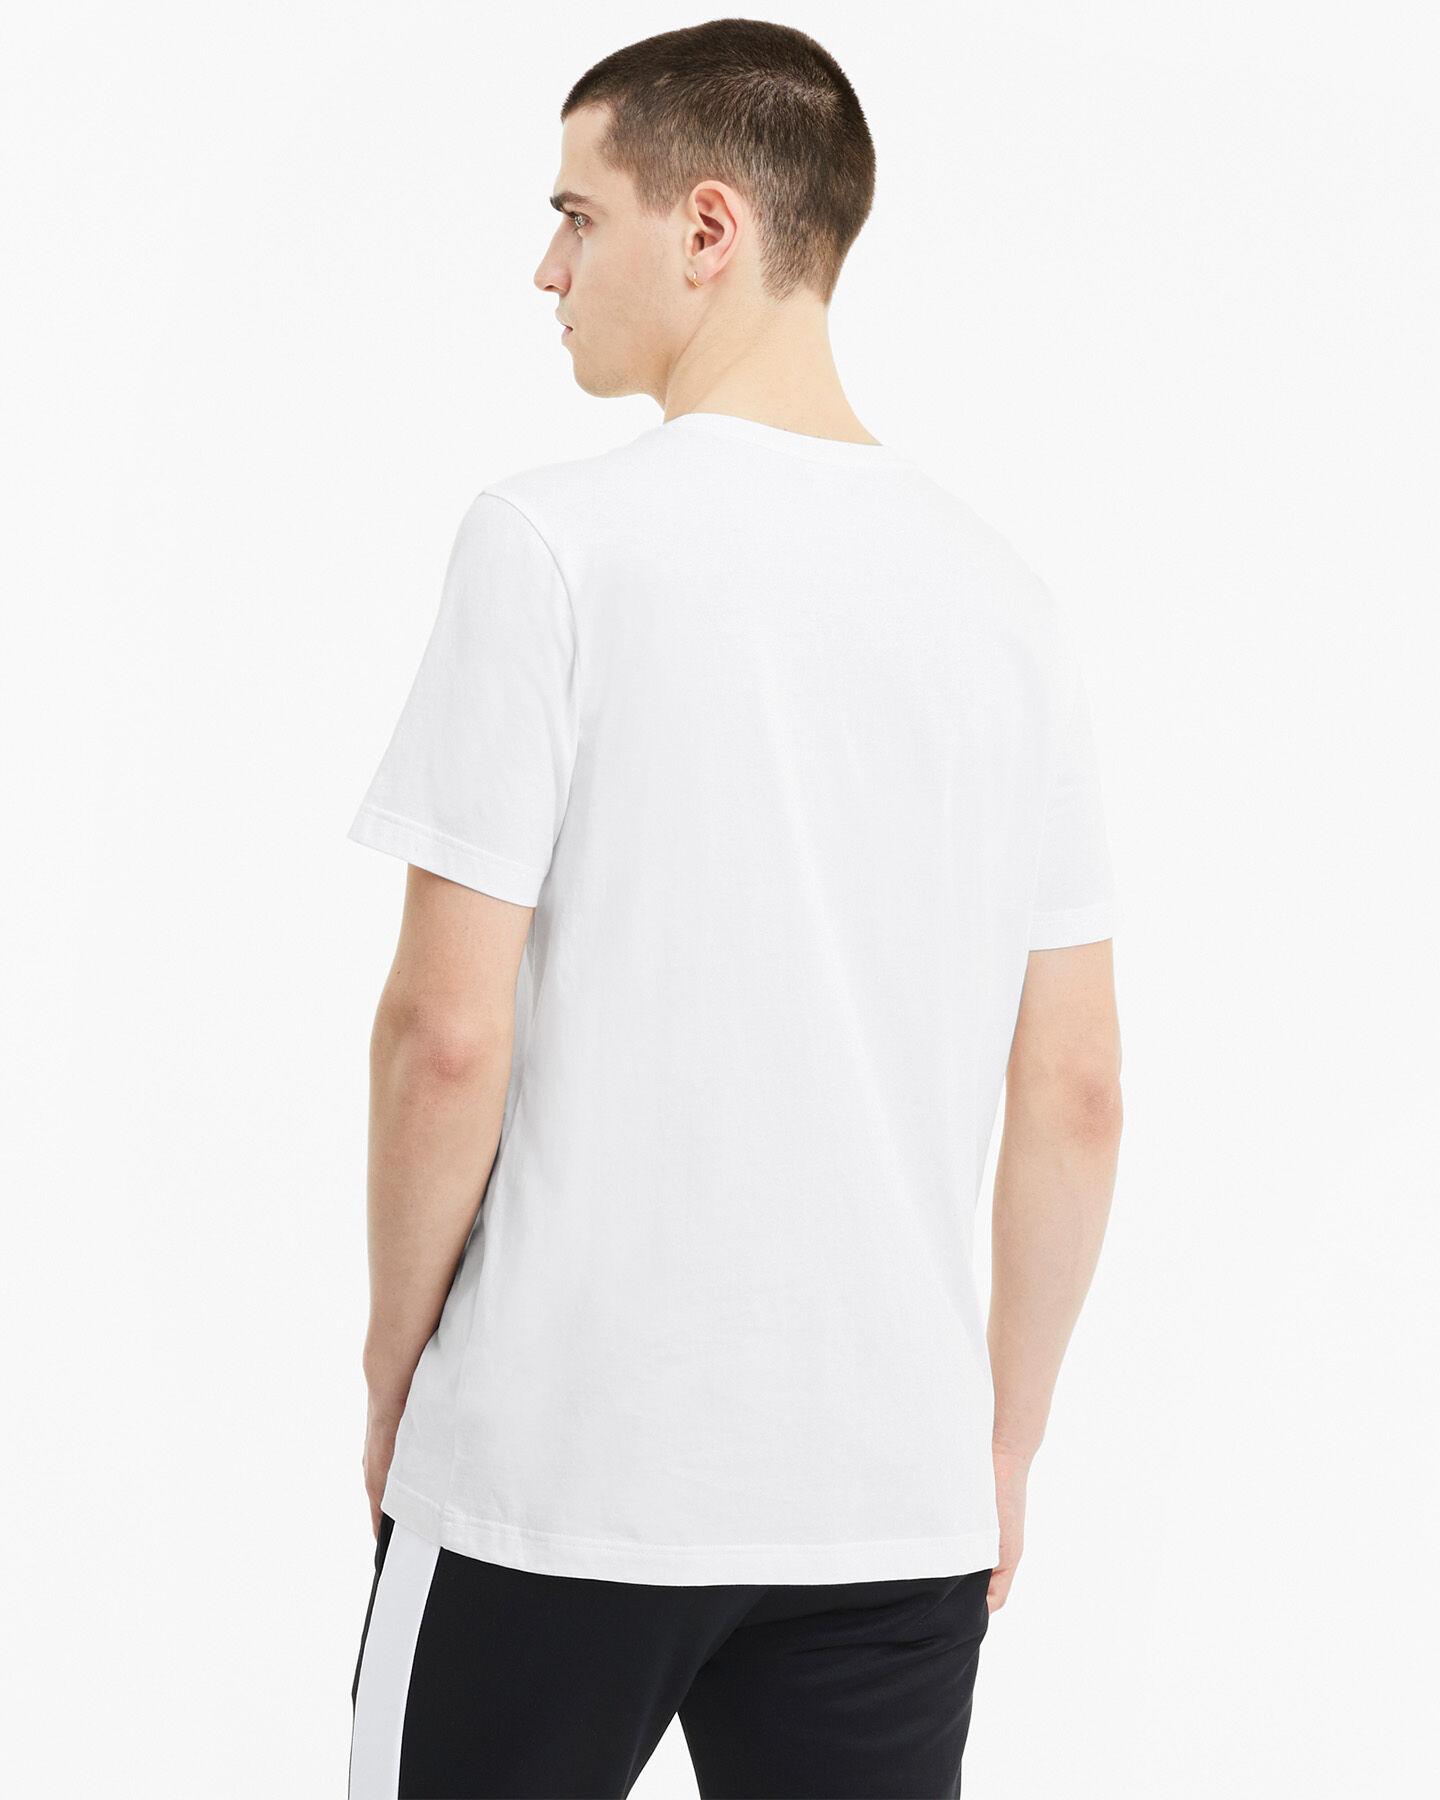 T-Shirt PUMA CLASSIC LOGO M S5235521 scatto 3